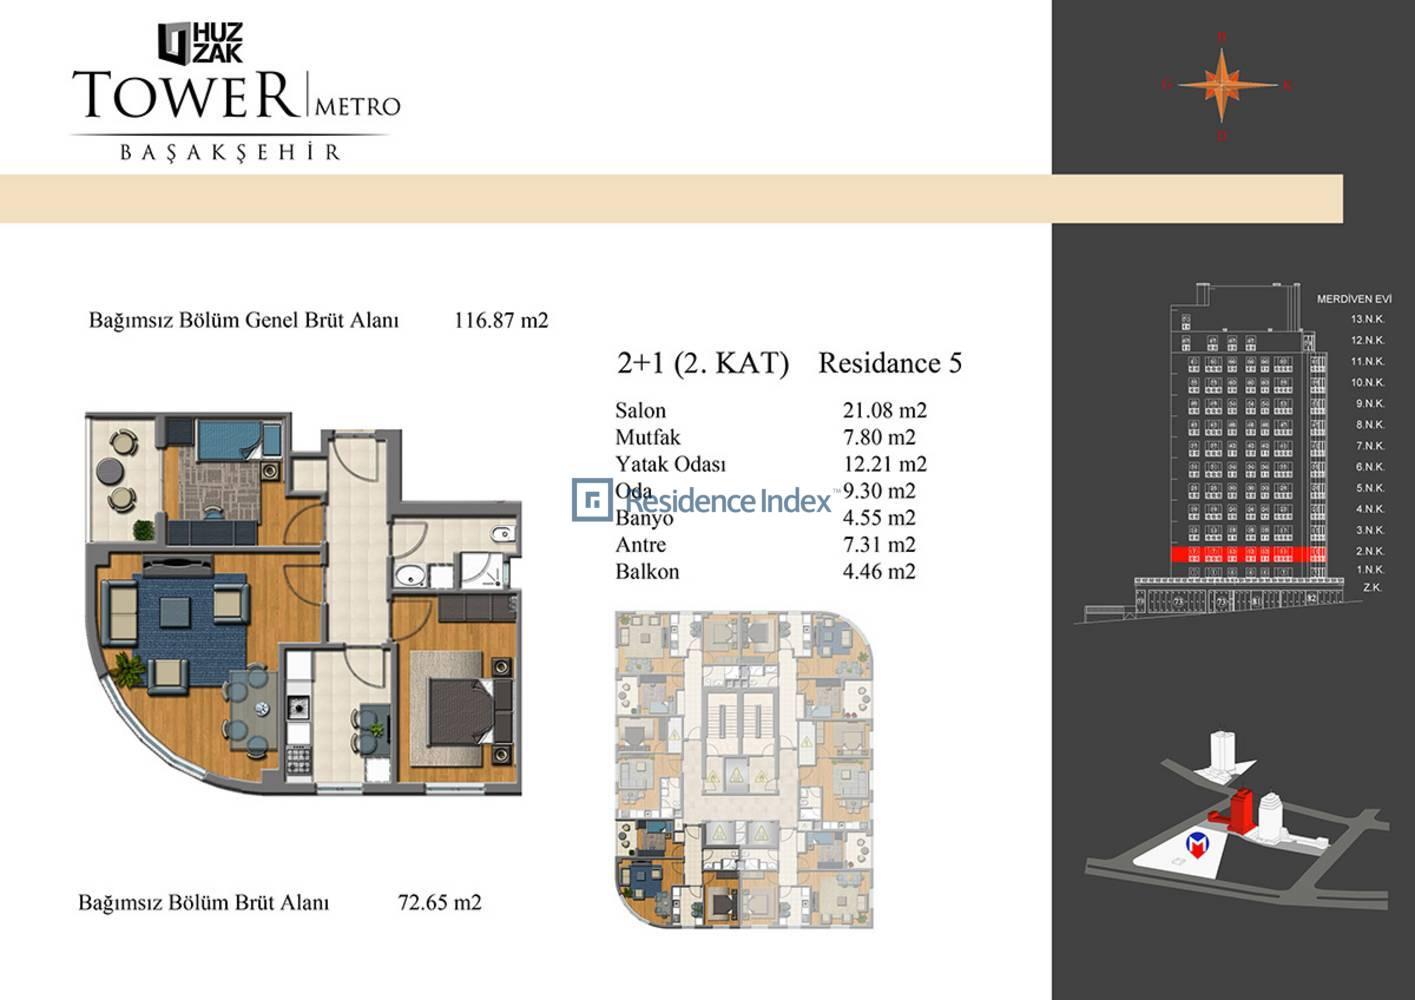 Huzzak Tower Metro Residence 5